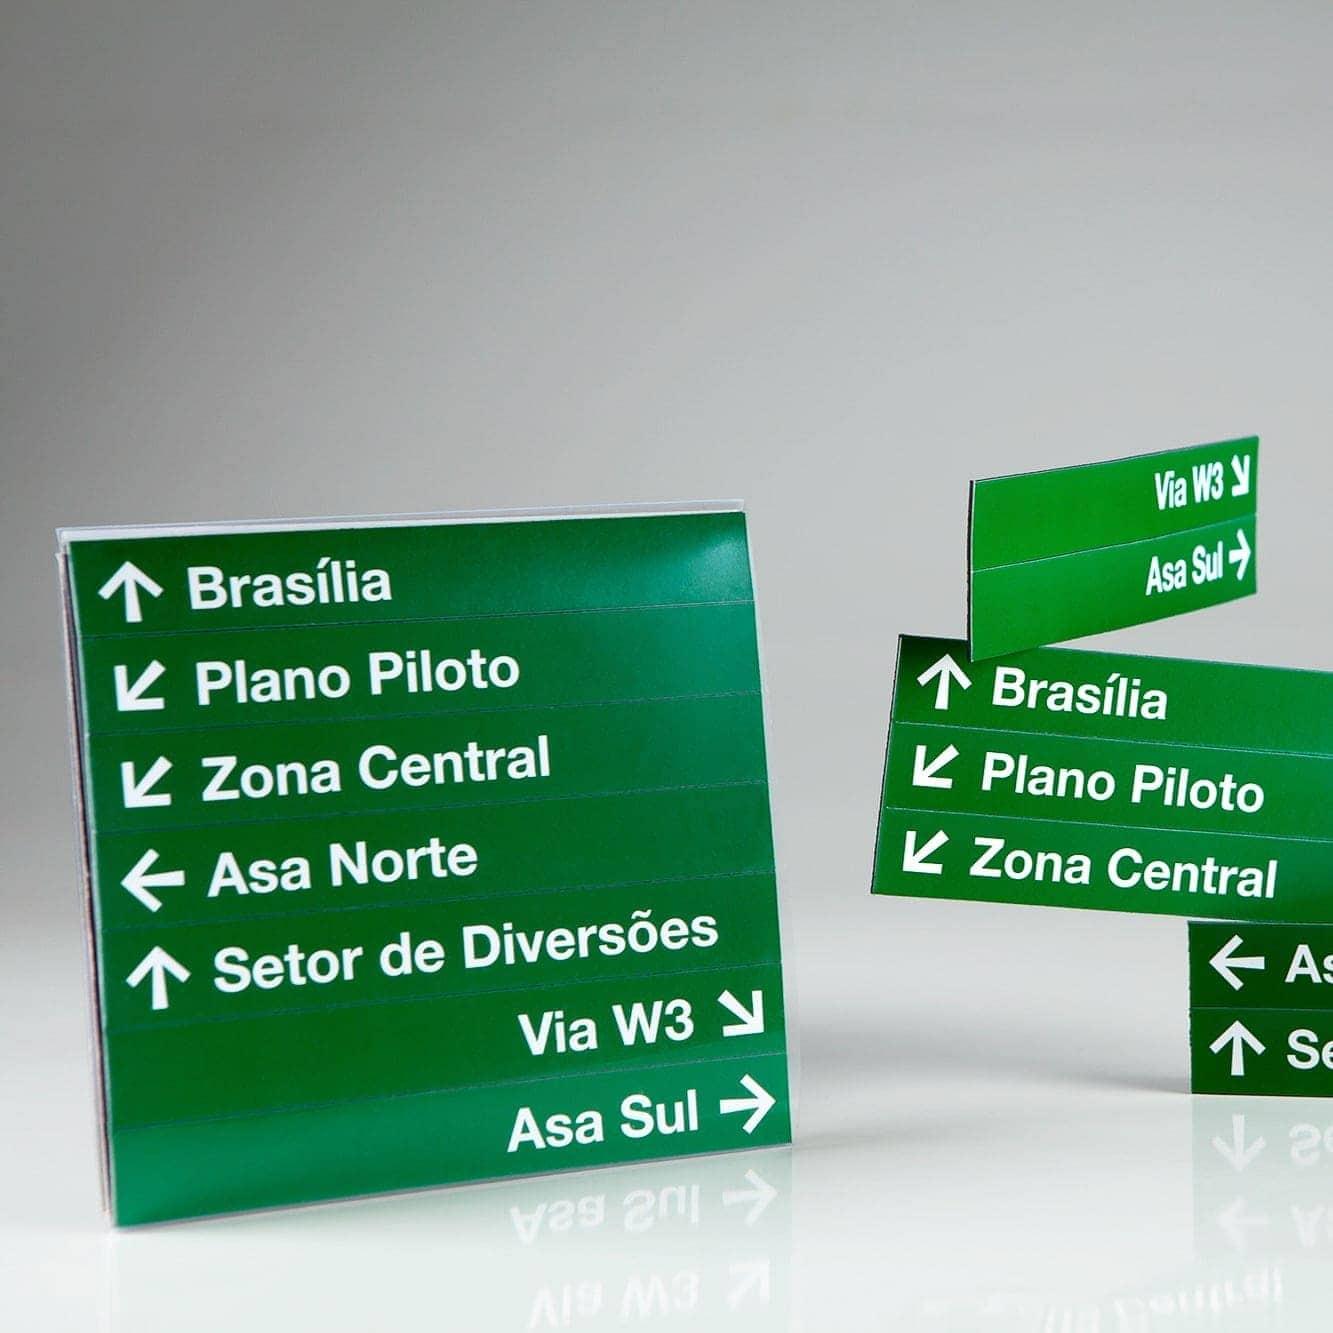 Ímãs Sinalização de Brasília